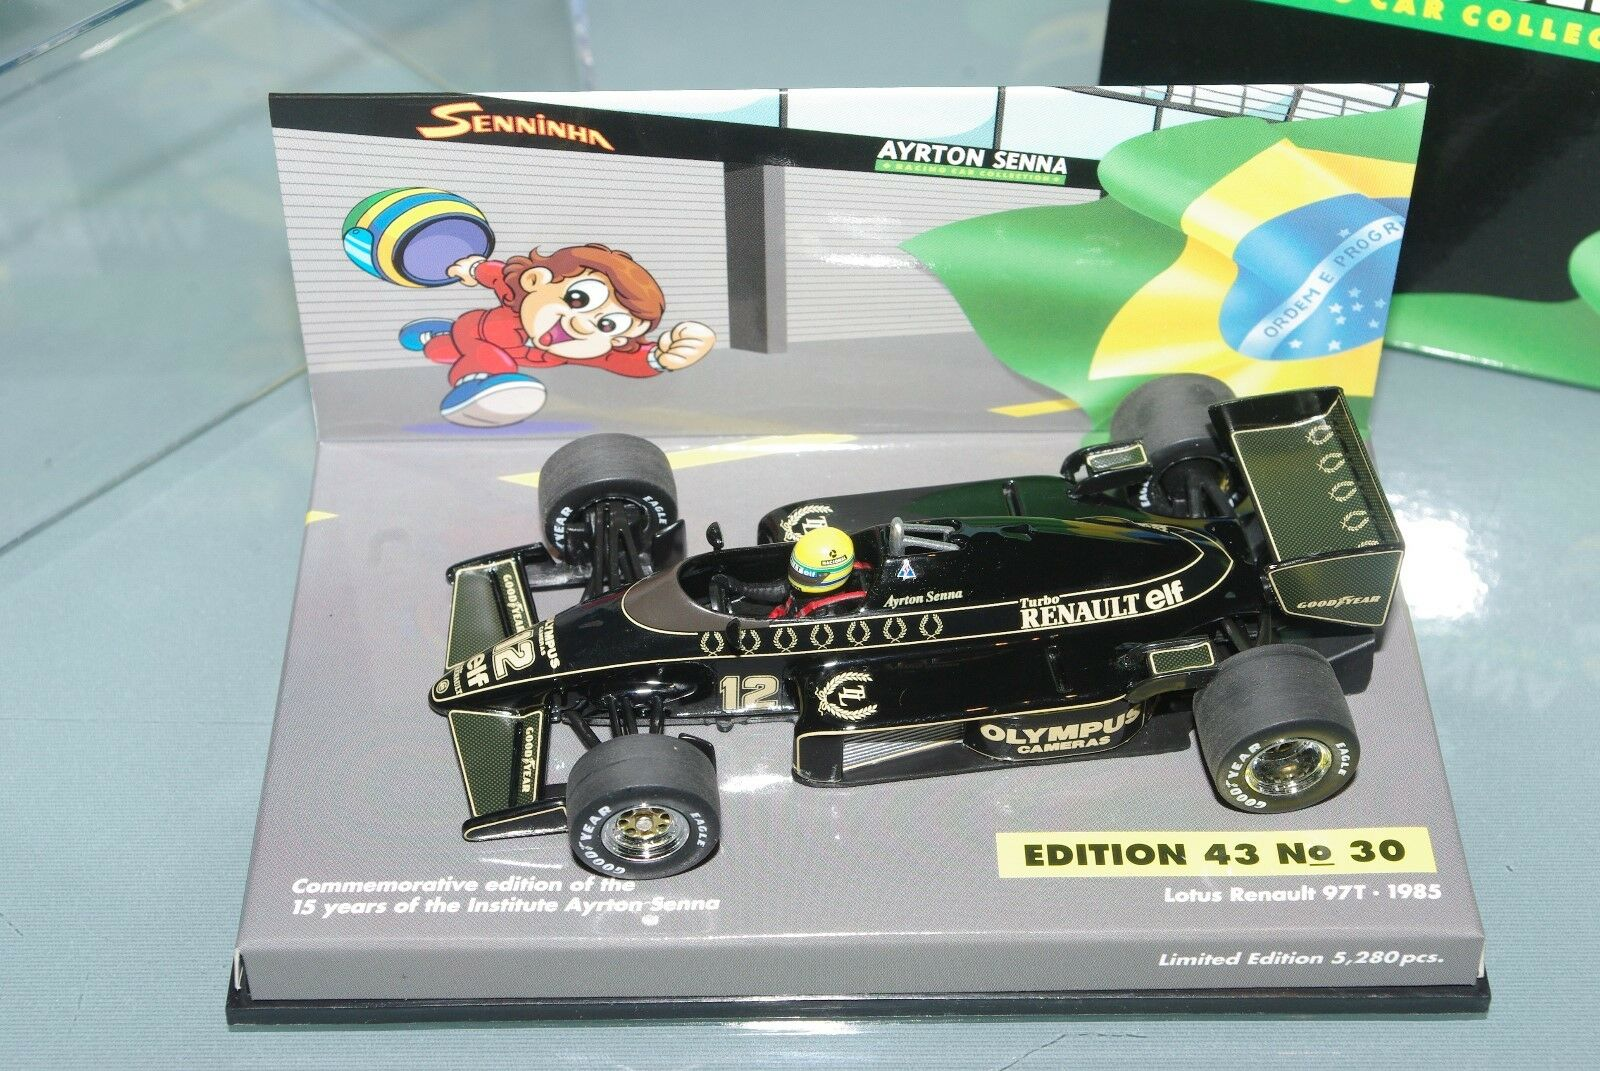 Minichamps F1 1 43 Lotus Renault  97 T 1985 SENNINHA Edition SENNA COLLECTION  30  liquidation de la boutique